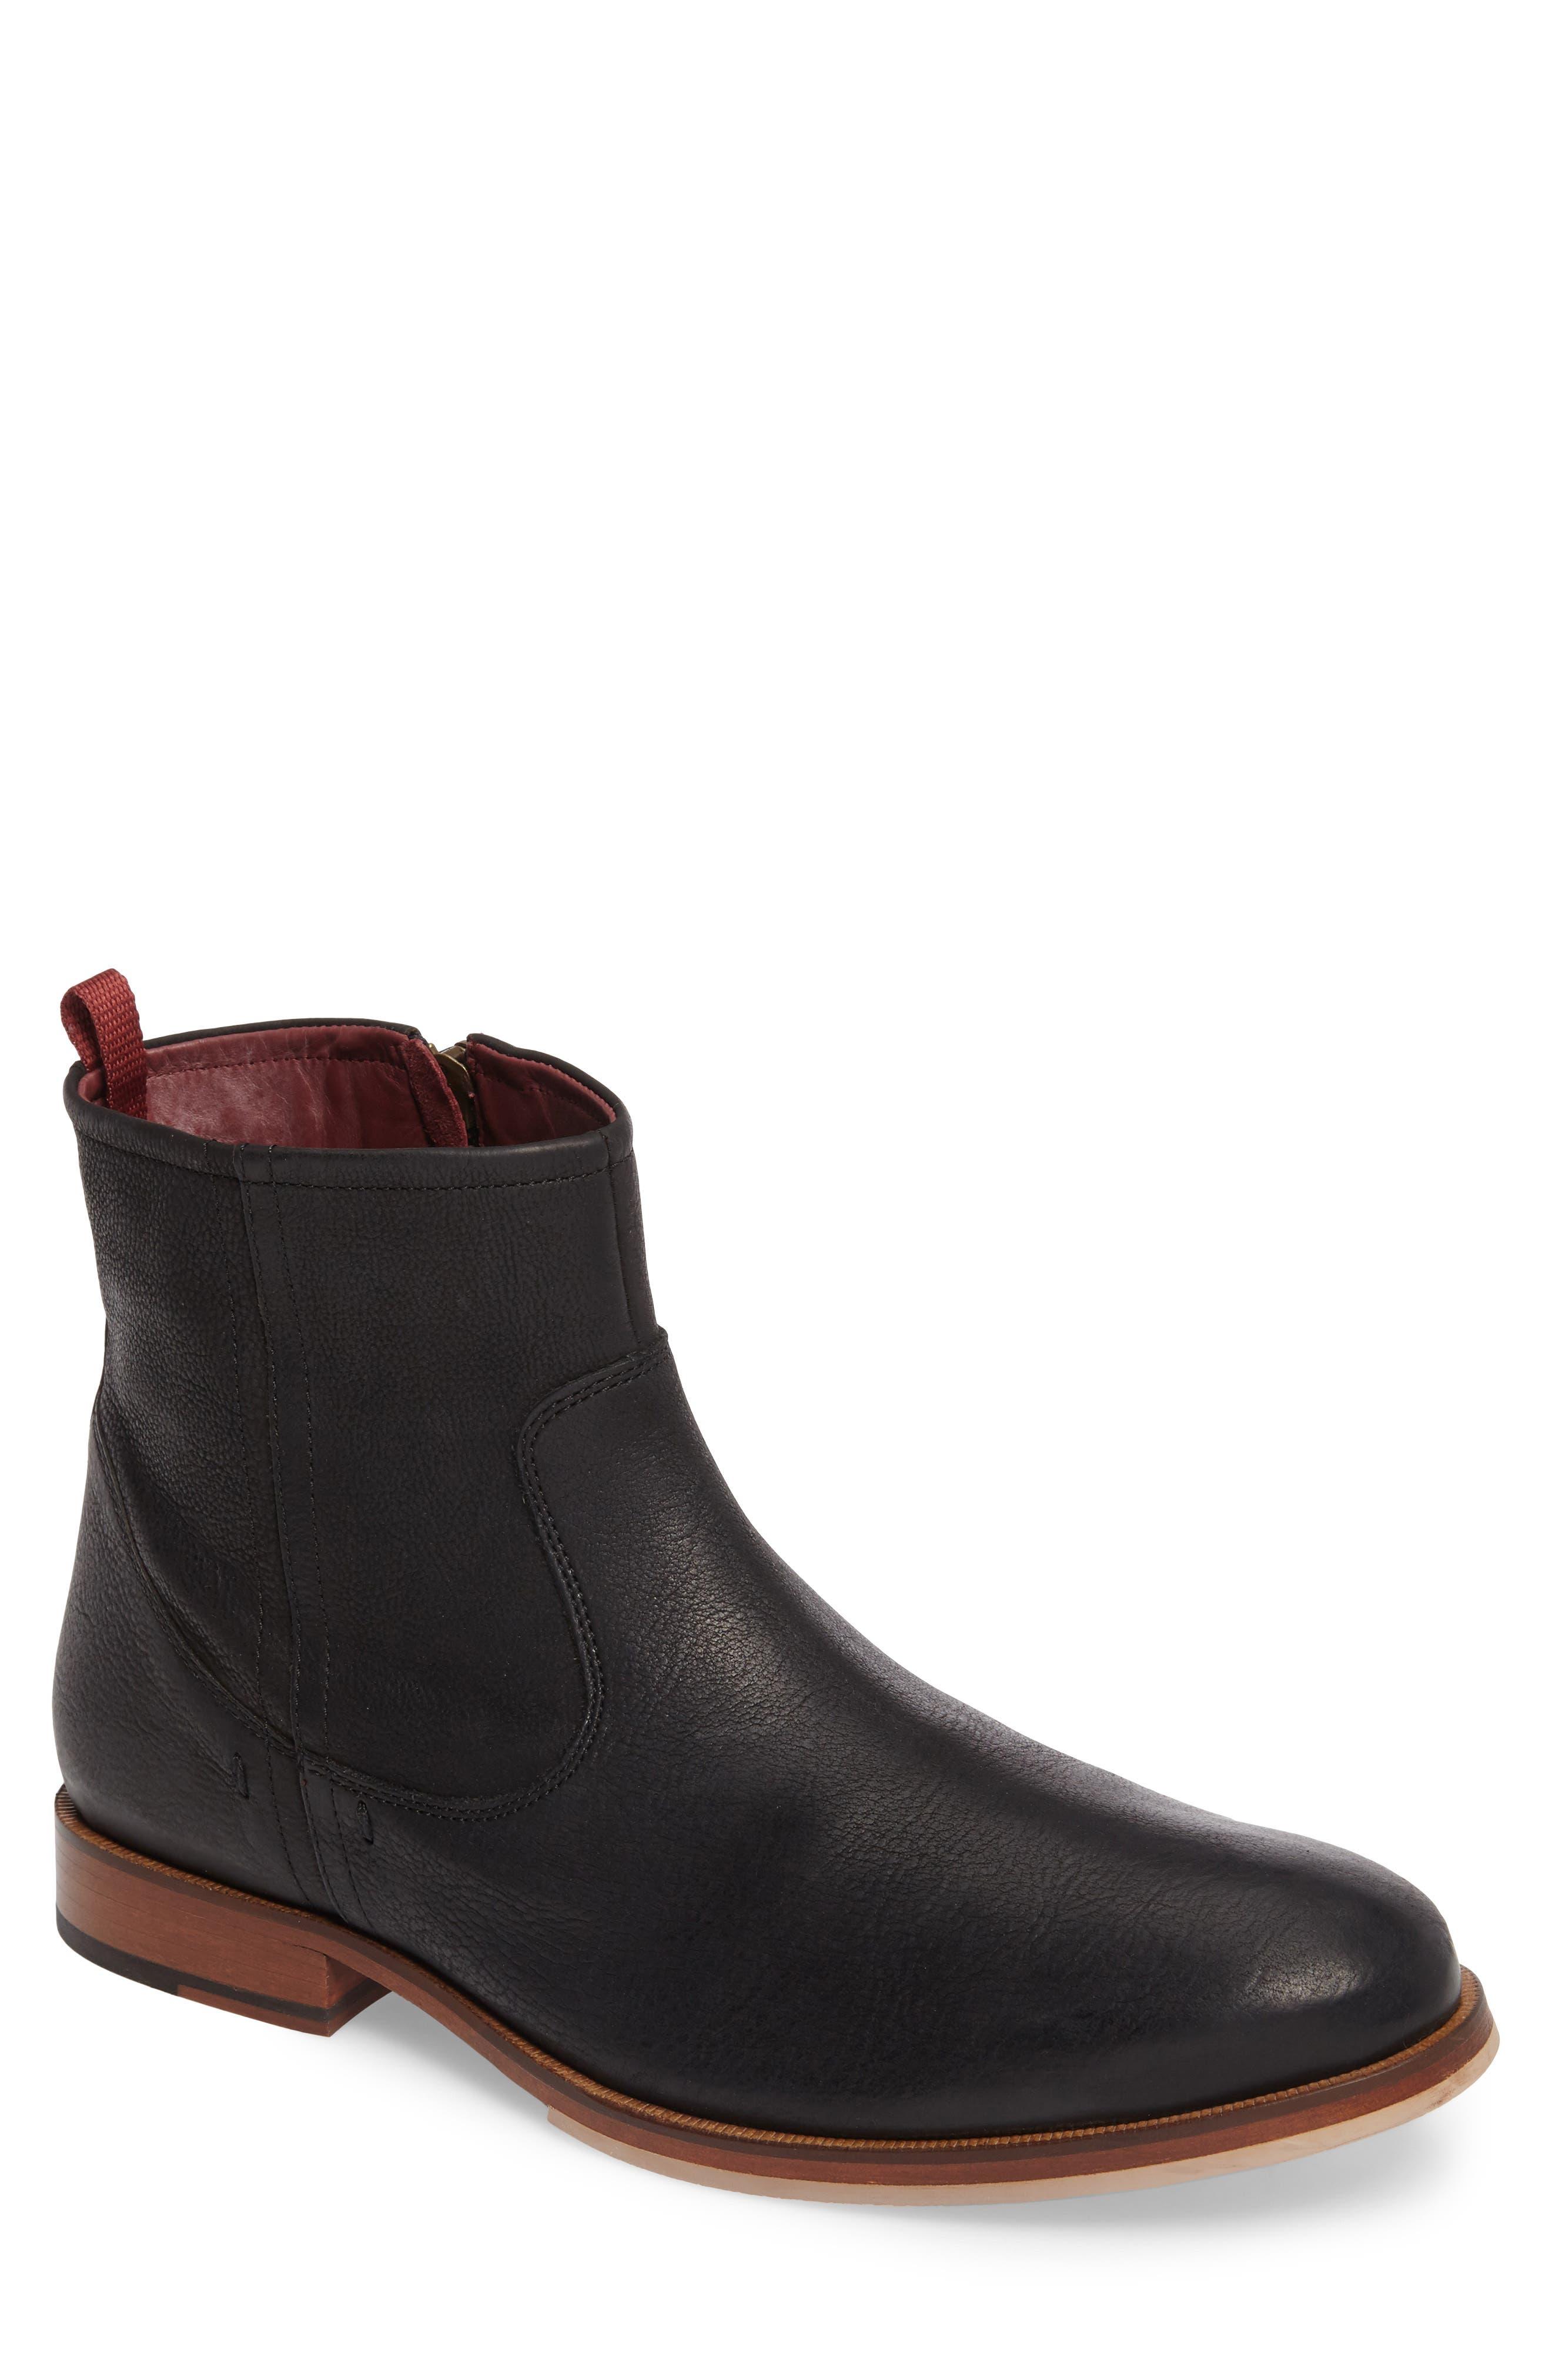 'Navarra' Zip Boot,                         Main,                         color, 001